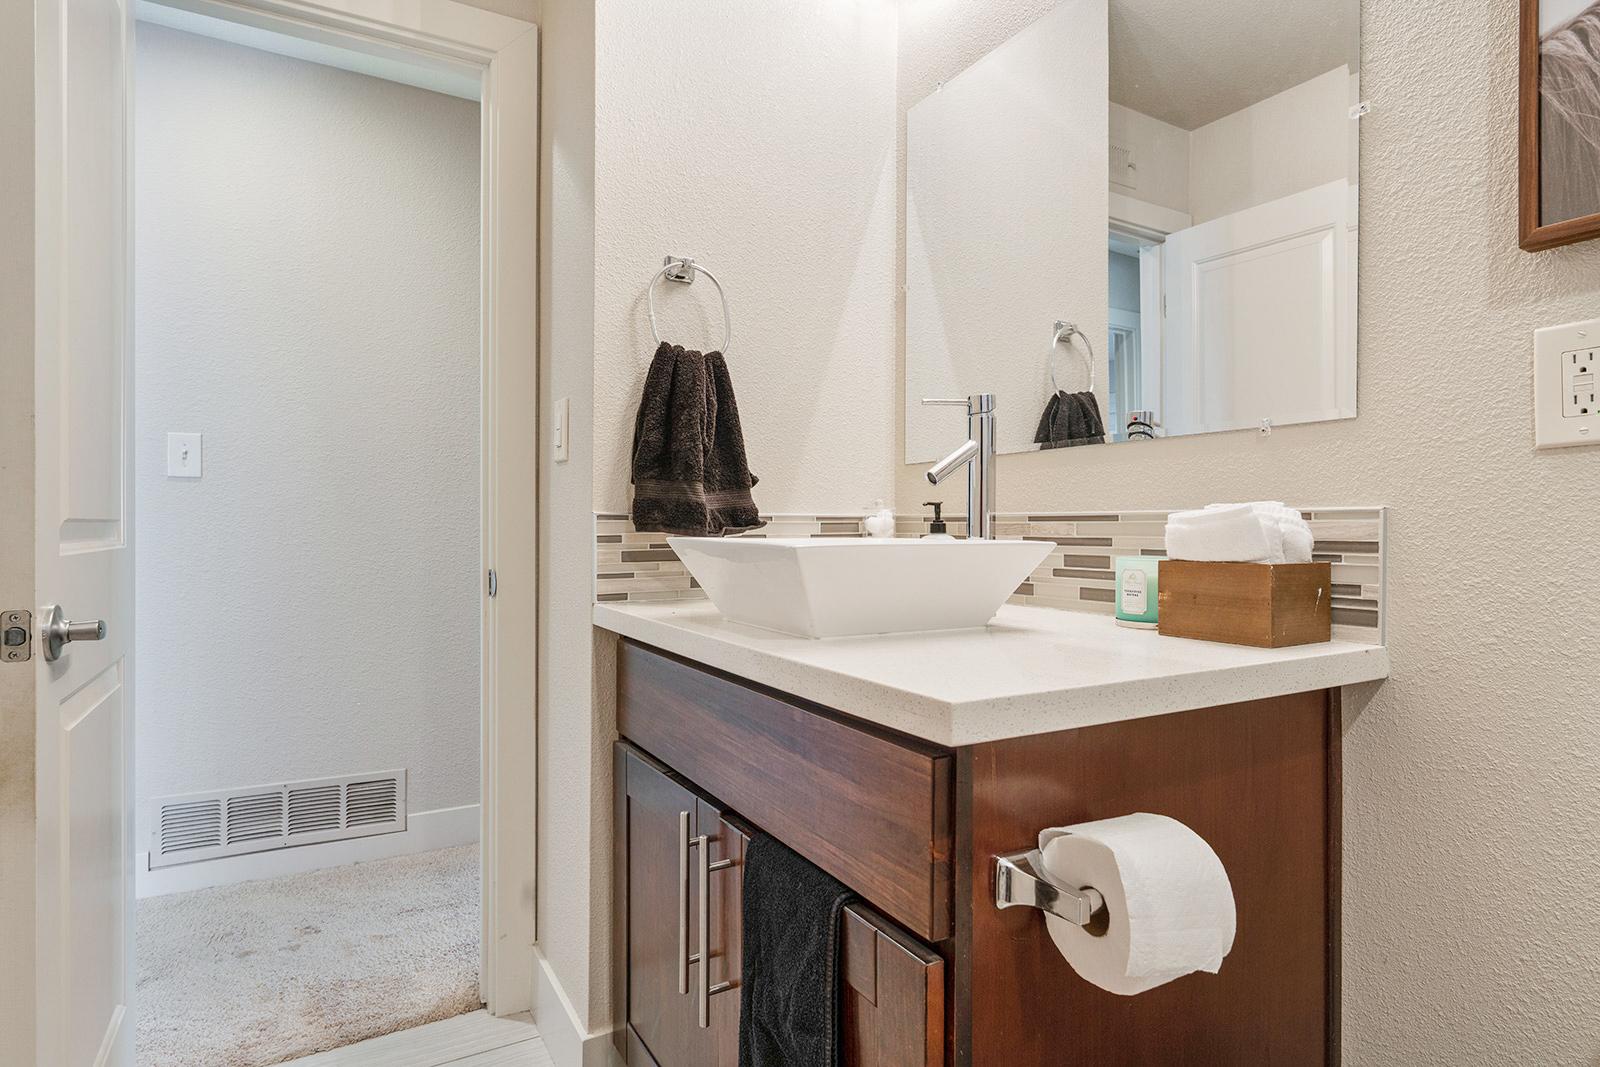 Upstairs hall bathroom of home at 6235 Everest Way, Sacramento, Ca.